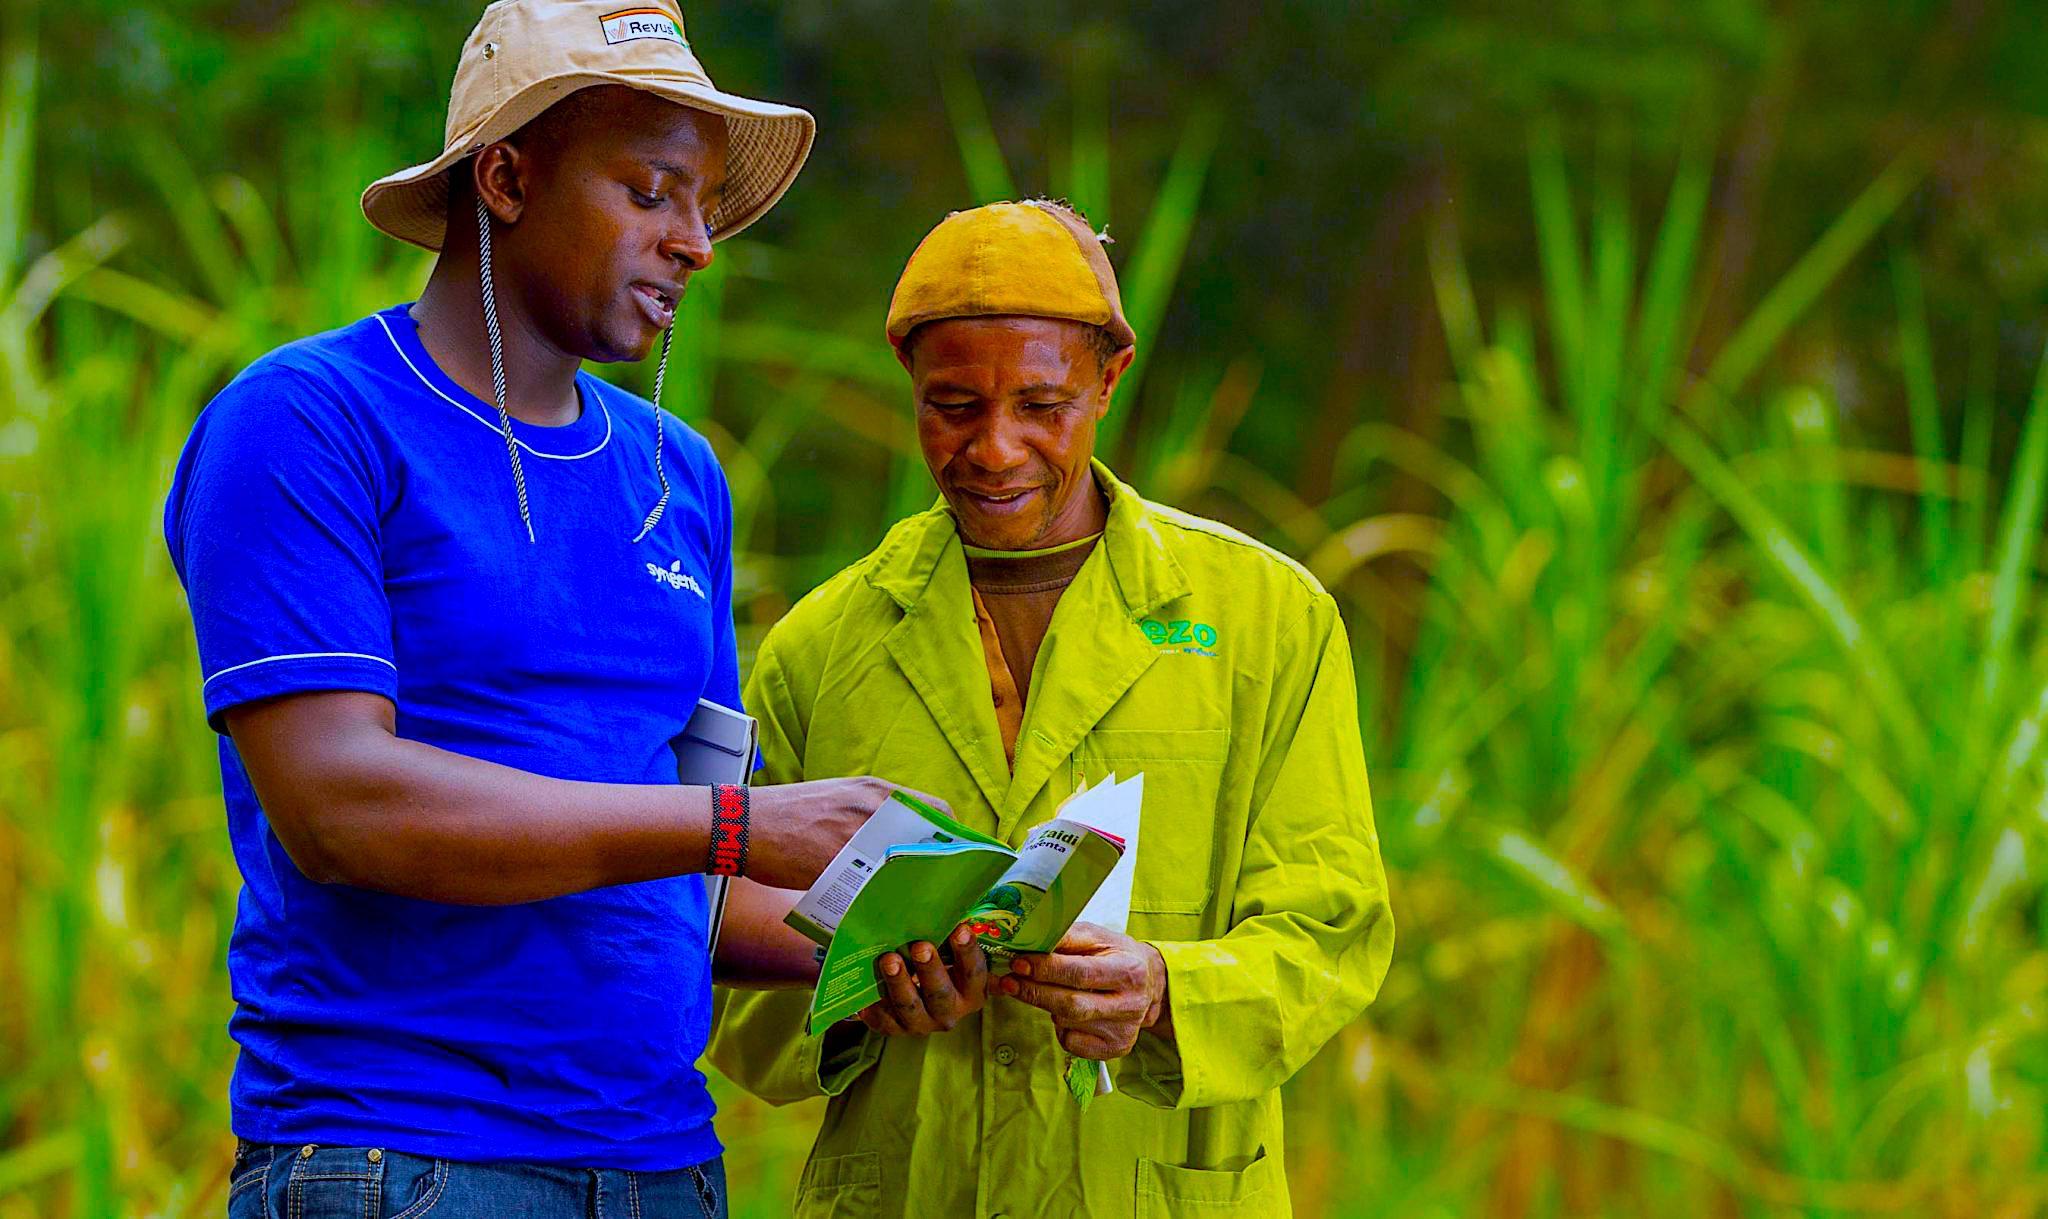 Nickson-Muturi-et-un-agriculteur-kenyan_-eShamba-1.jpg